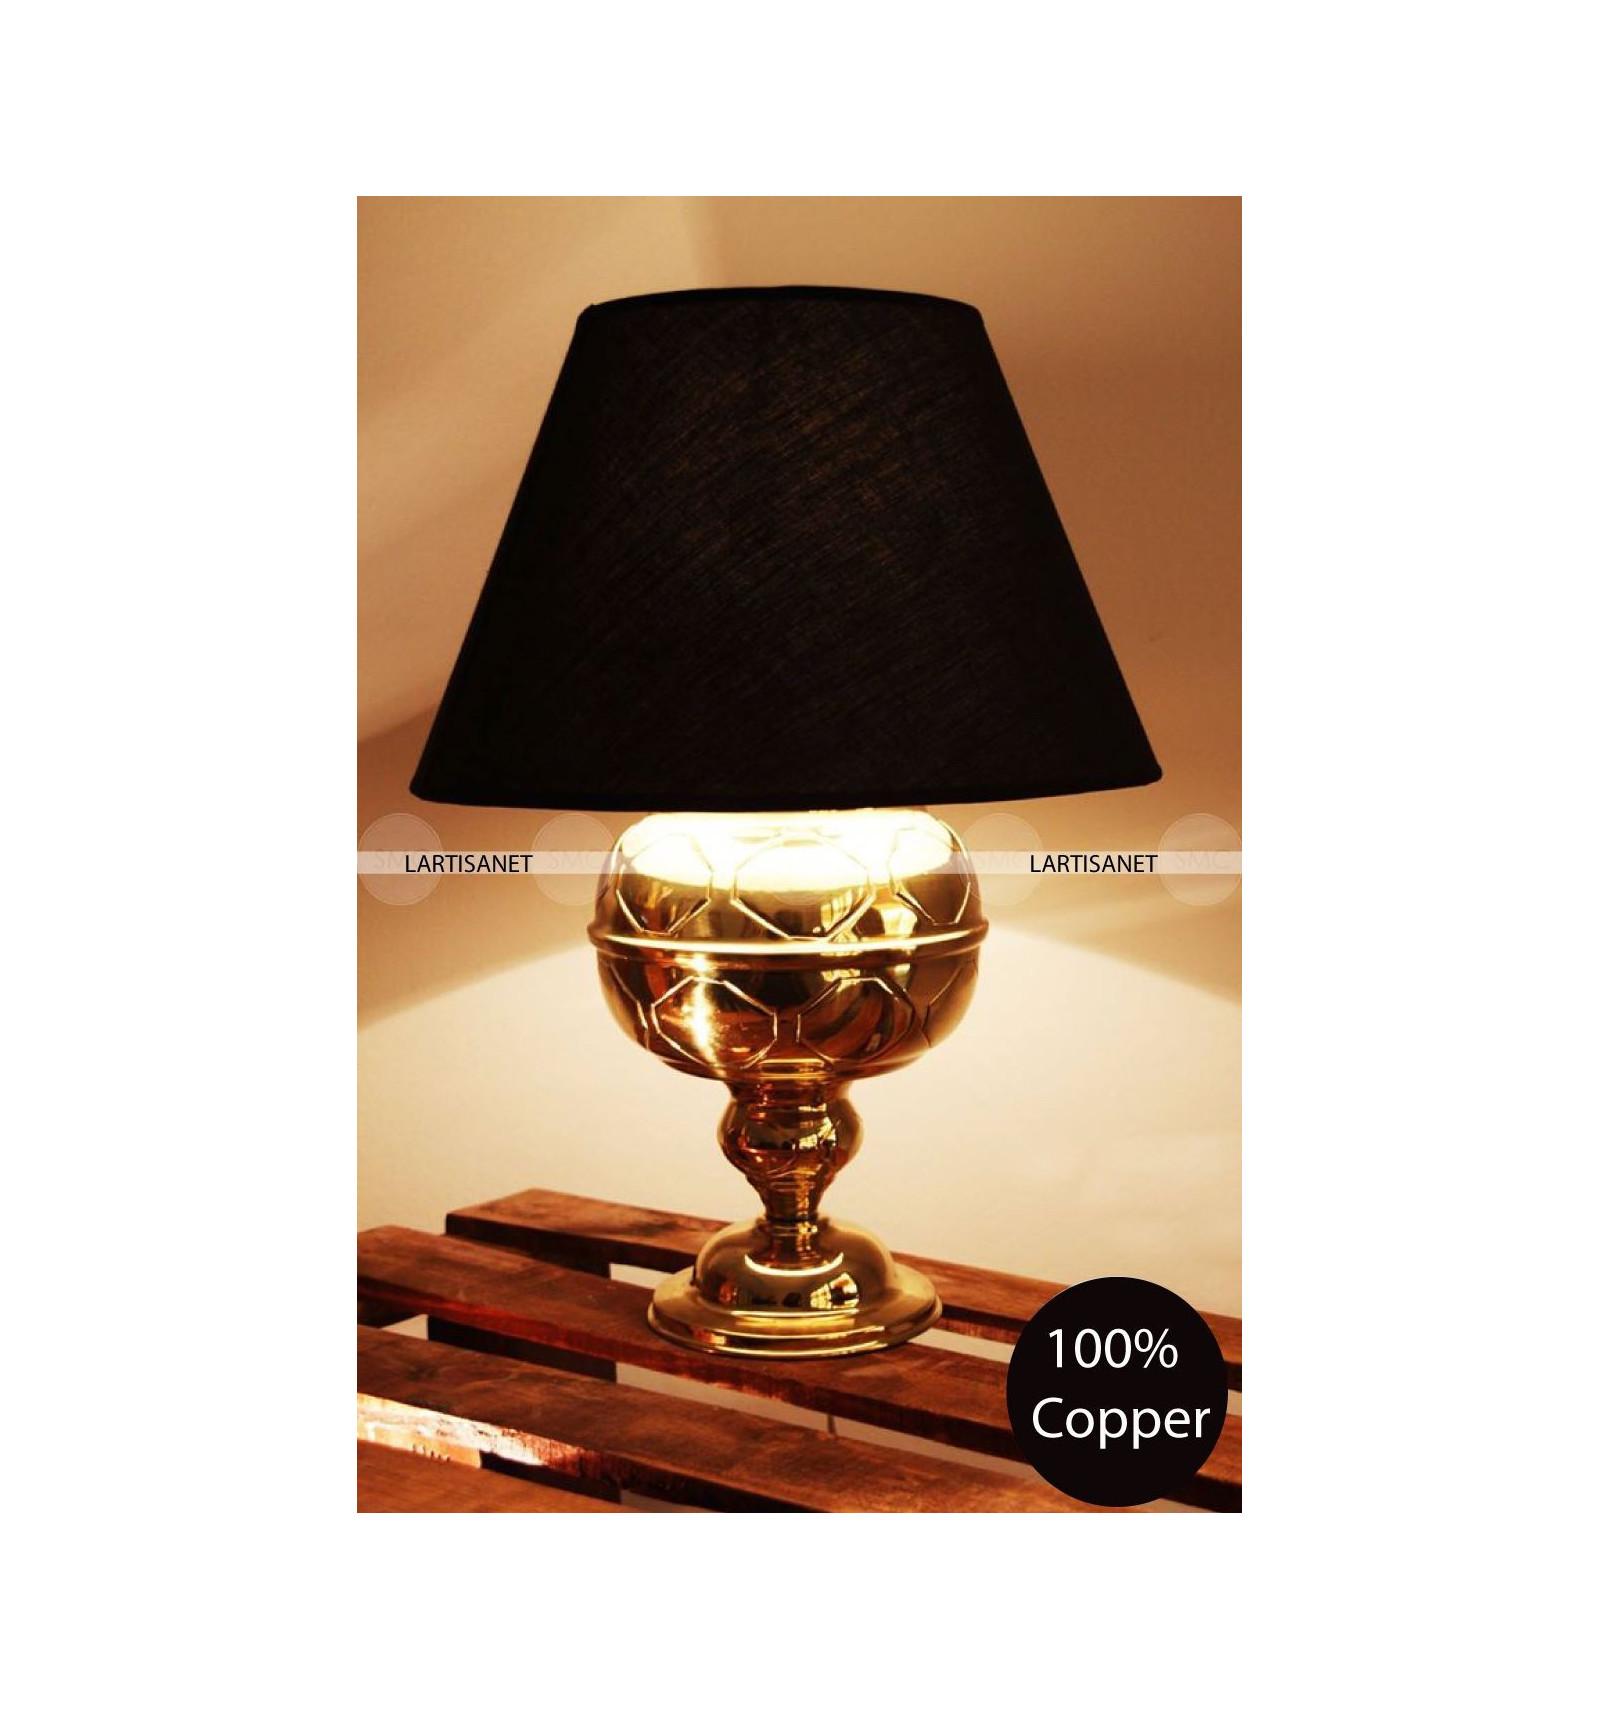 lampe de table baroque laiton. Black Bedroom Furniture Sets. Home Design Ideas